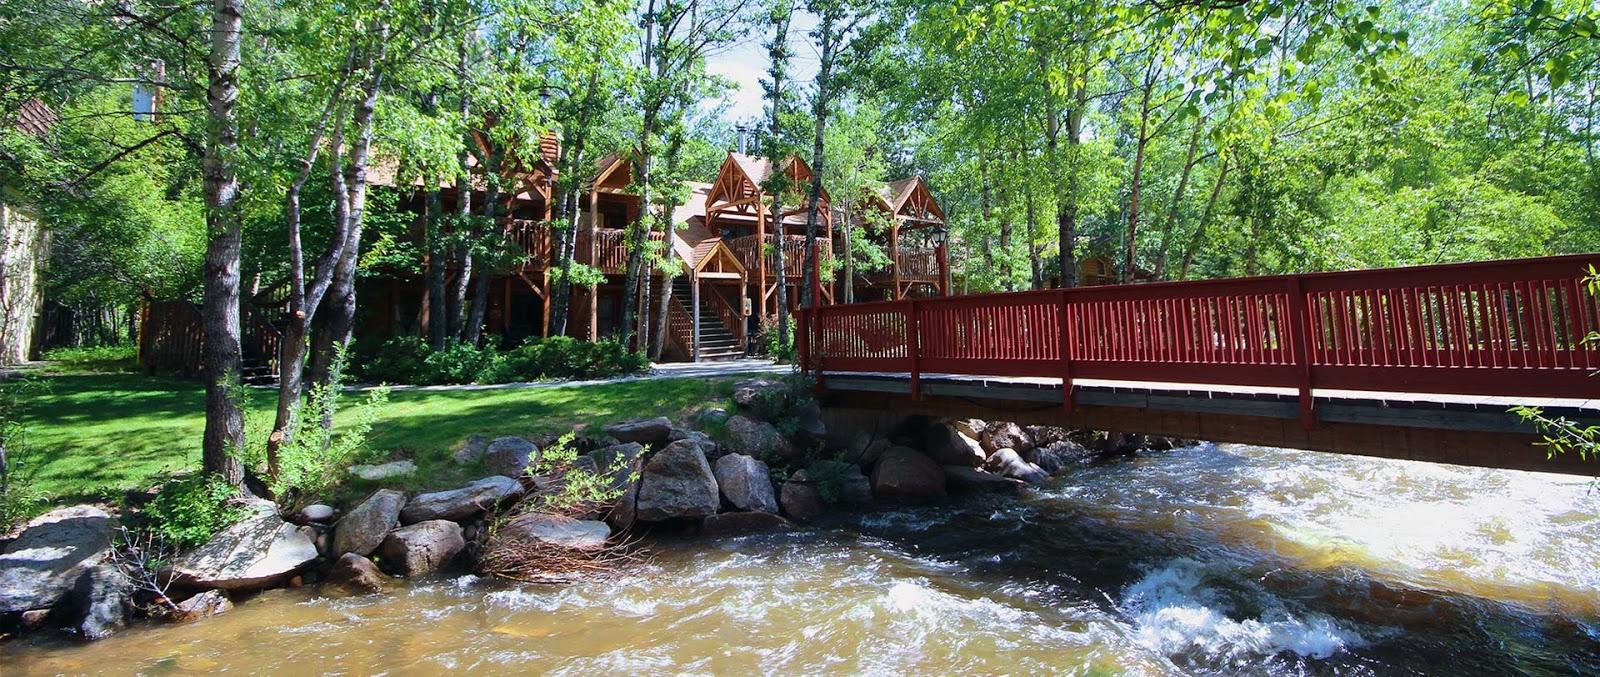 Hotels In Estes Park Colorado With Hot Tubs